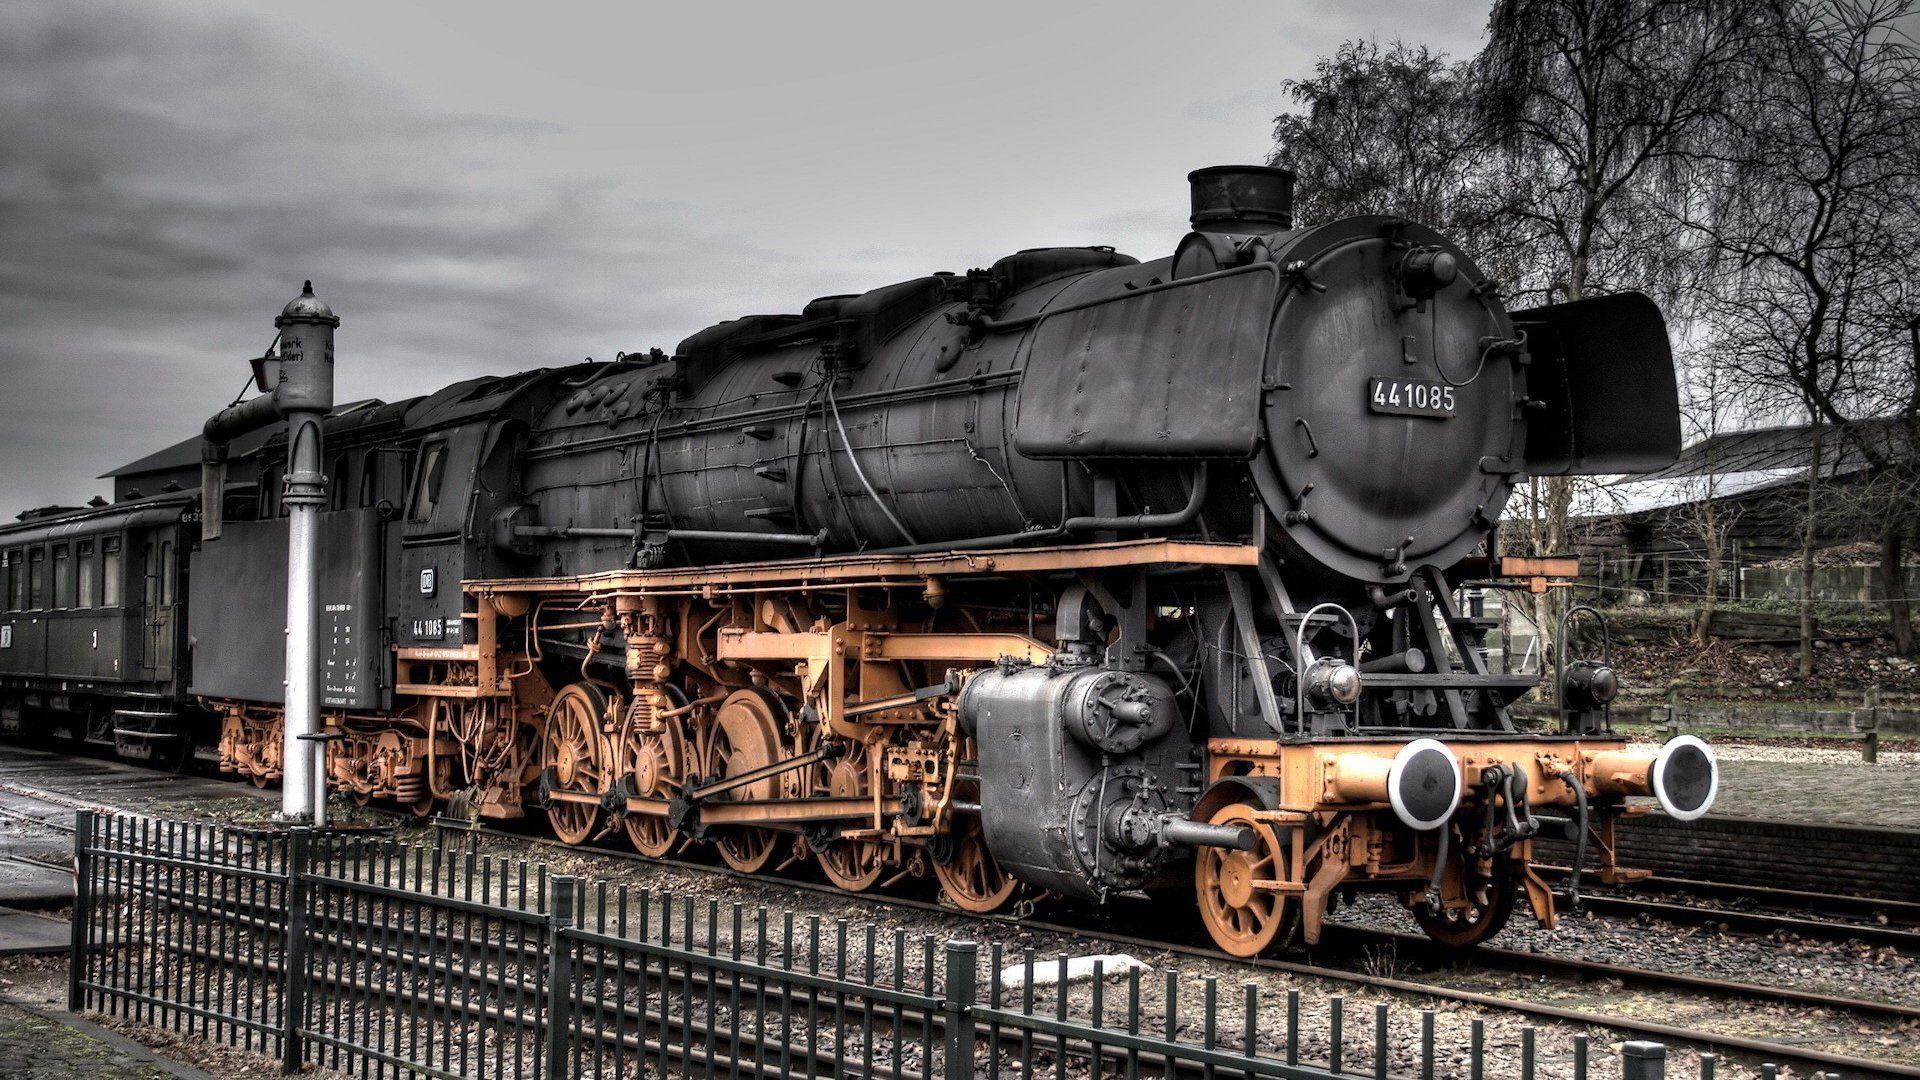 train_railroad_tracks_locomotive_engine_tractor_railway_3840x2160.jpg